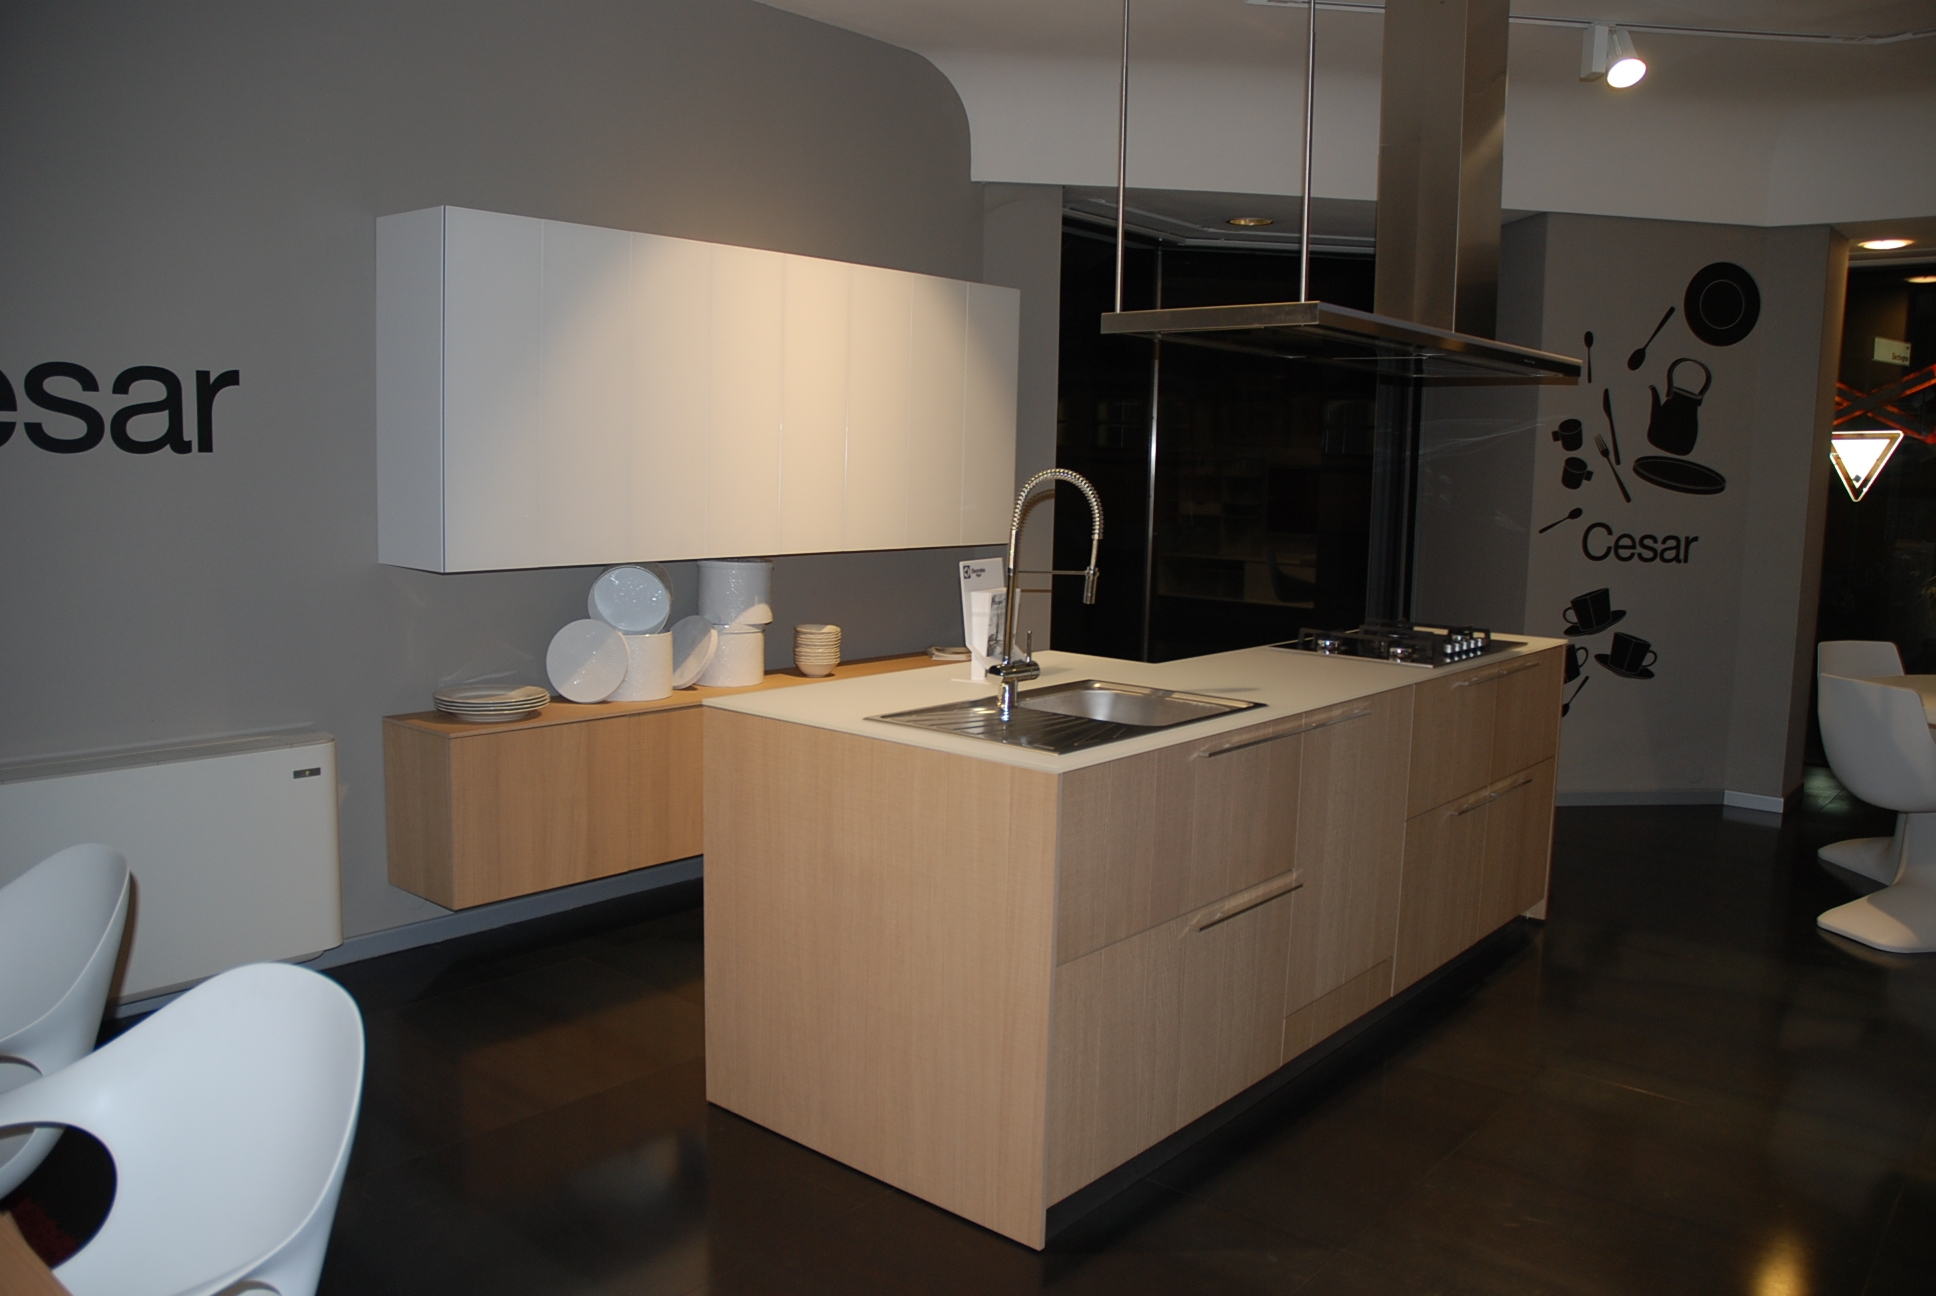 Cucina cesar cucine kalea legno rovere taglio sega naturale e pensili in vetro opaco moderne - Cucine moderne in legno naturale ...